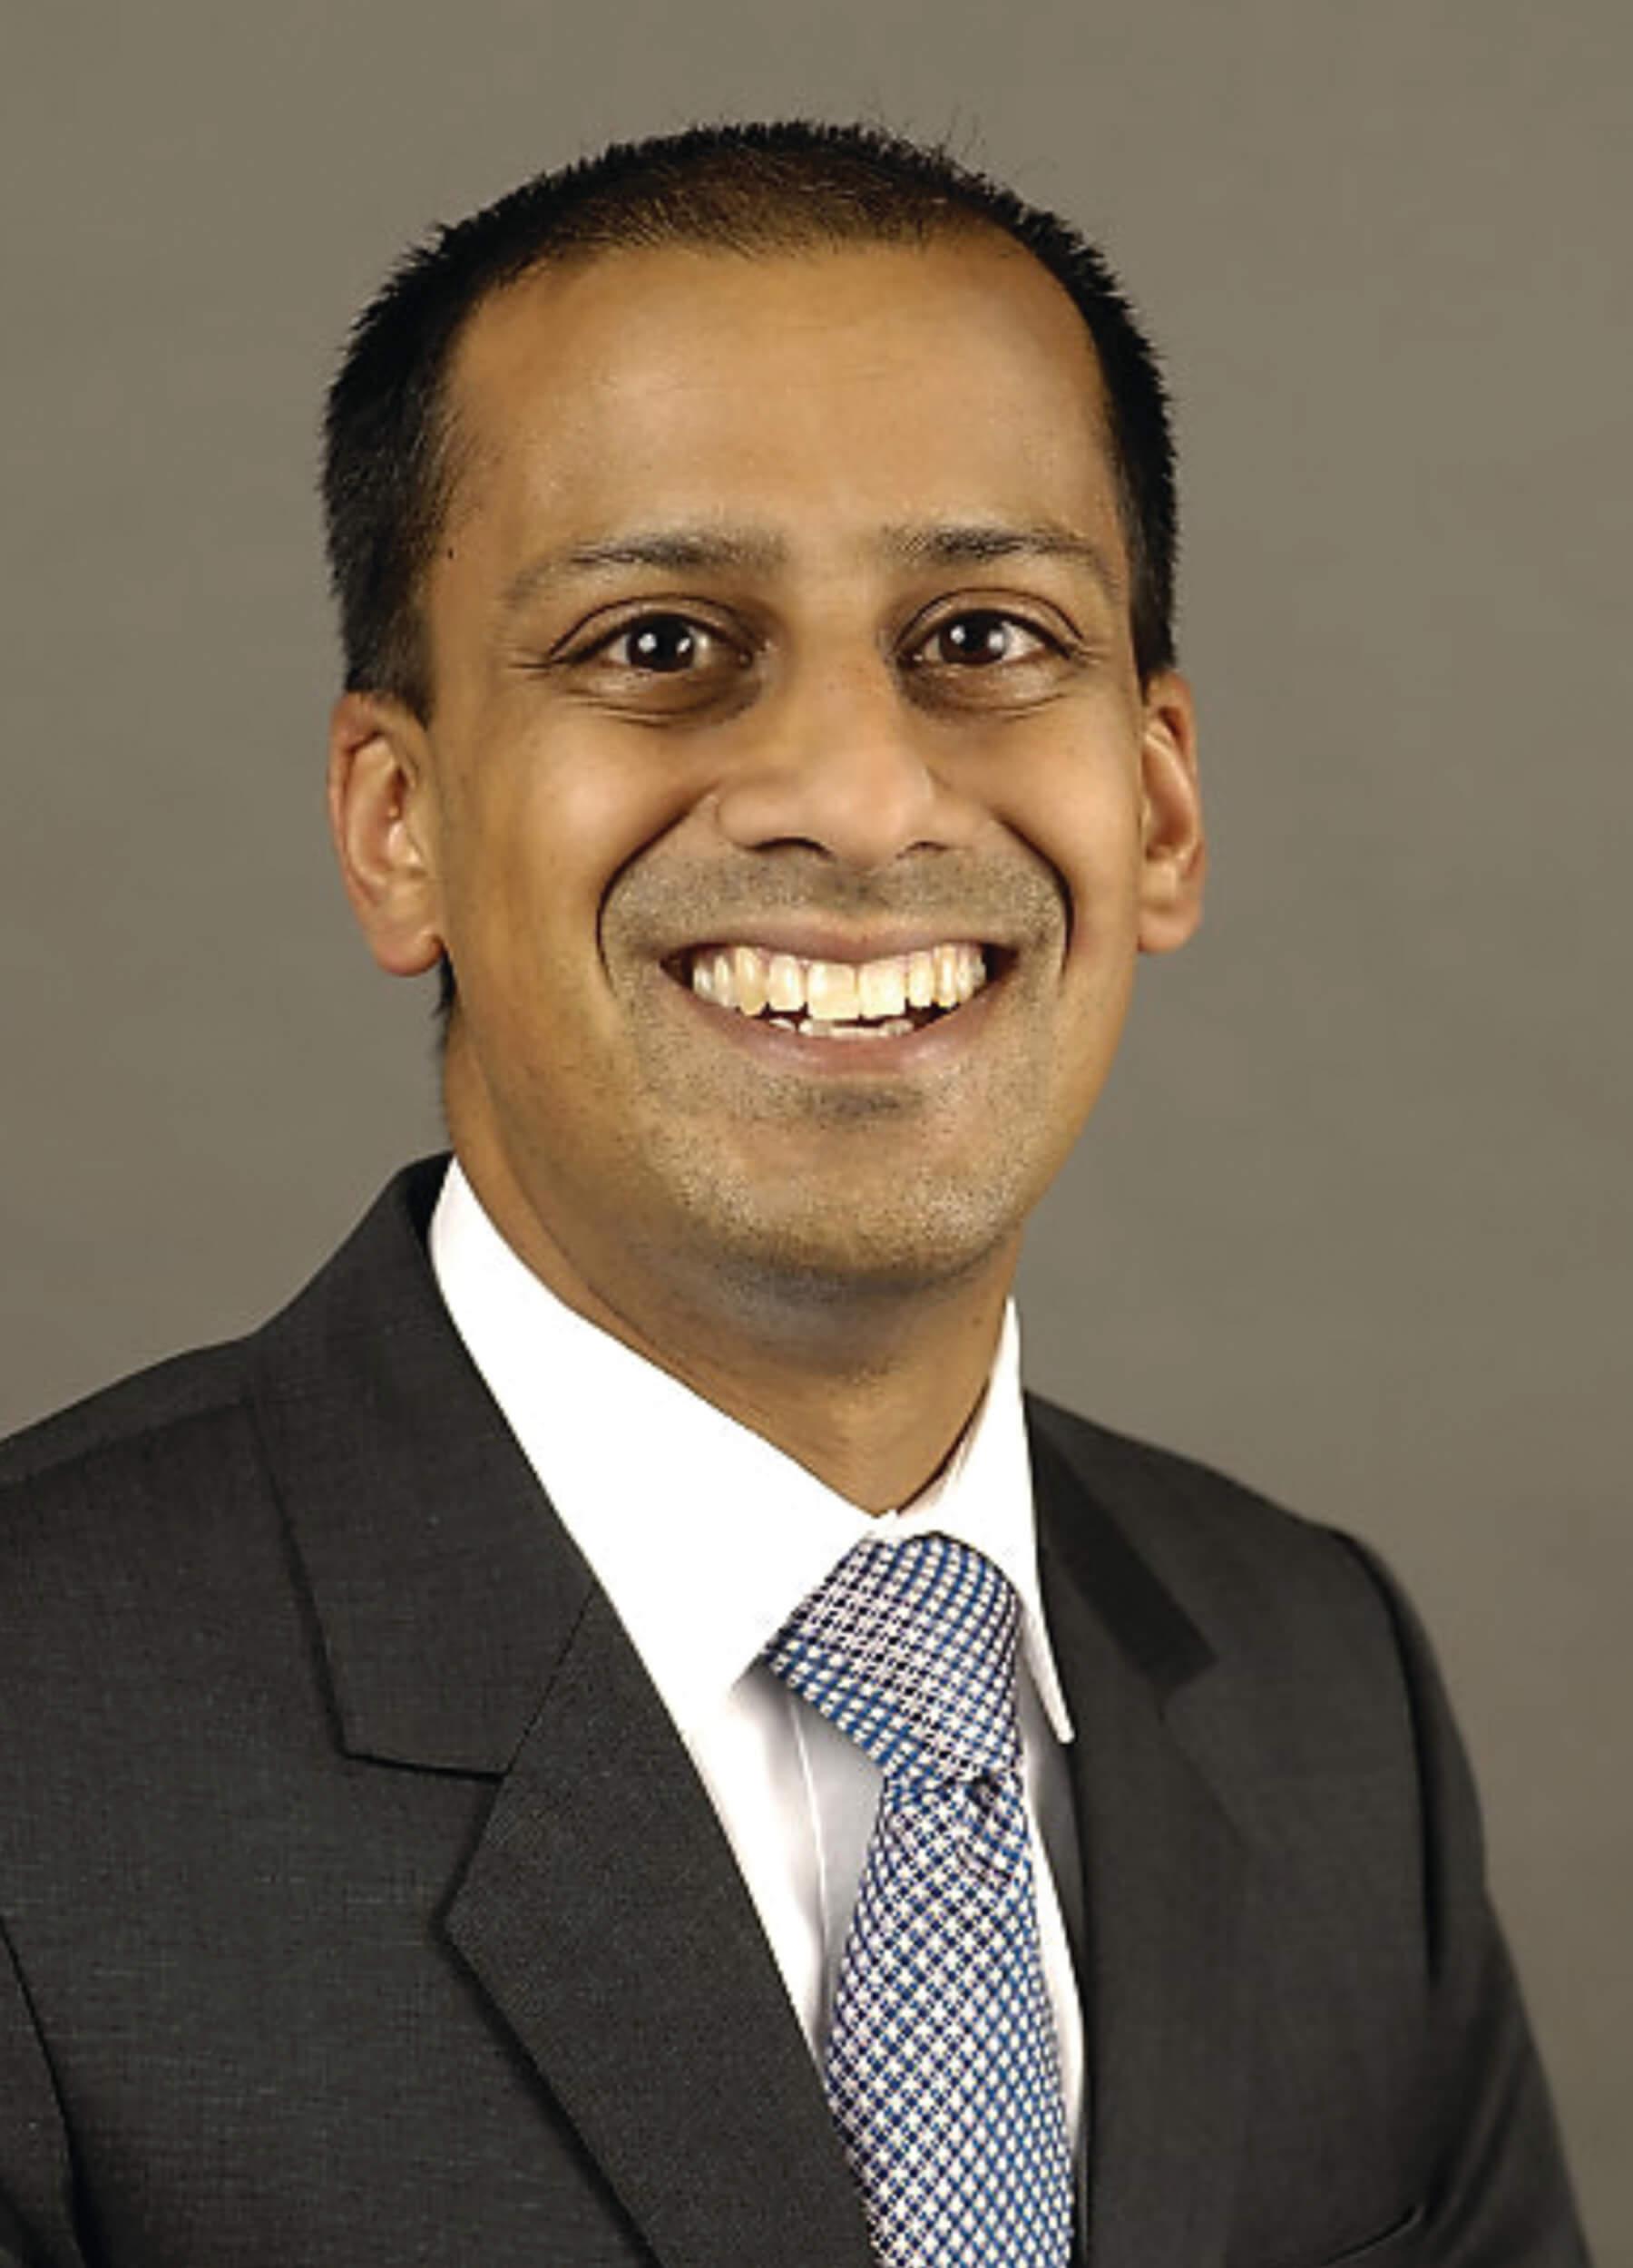 Ankoor S. Shah, MD, PhD